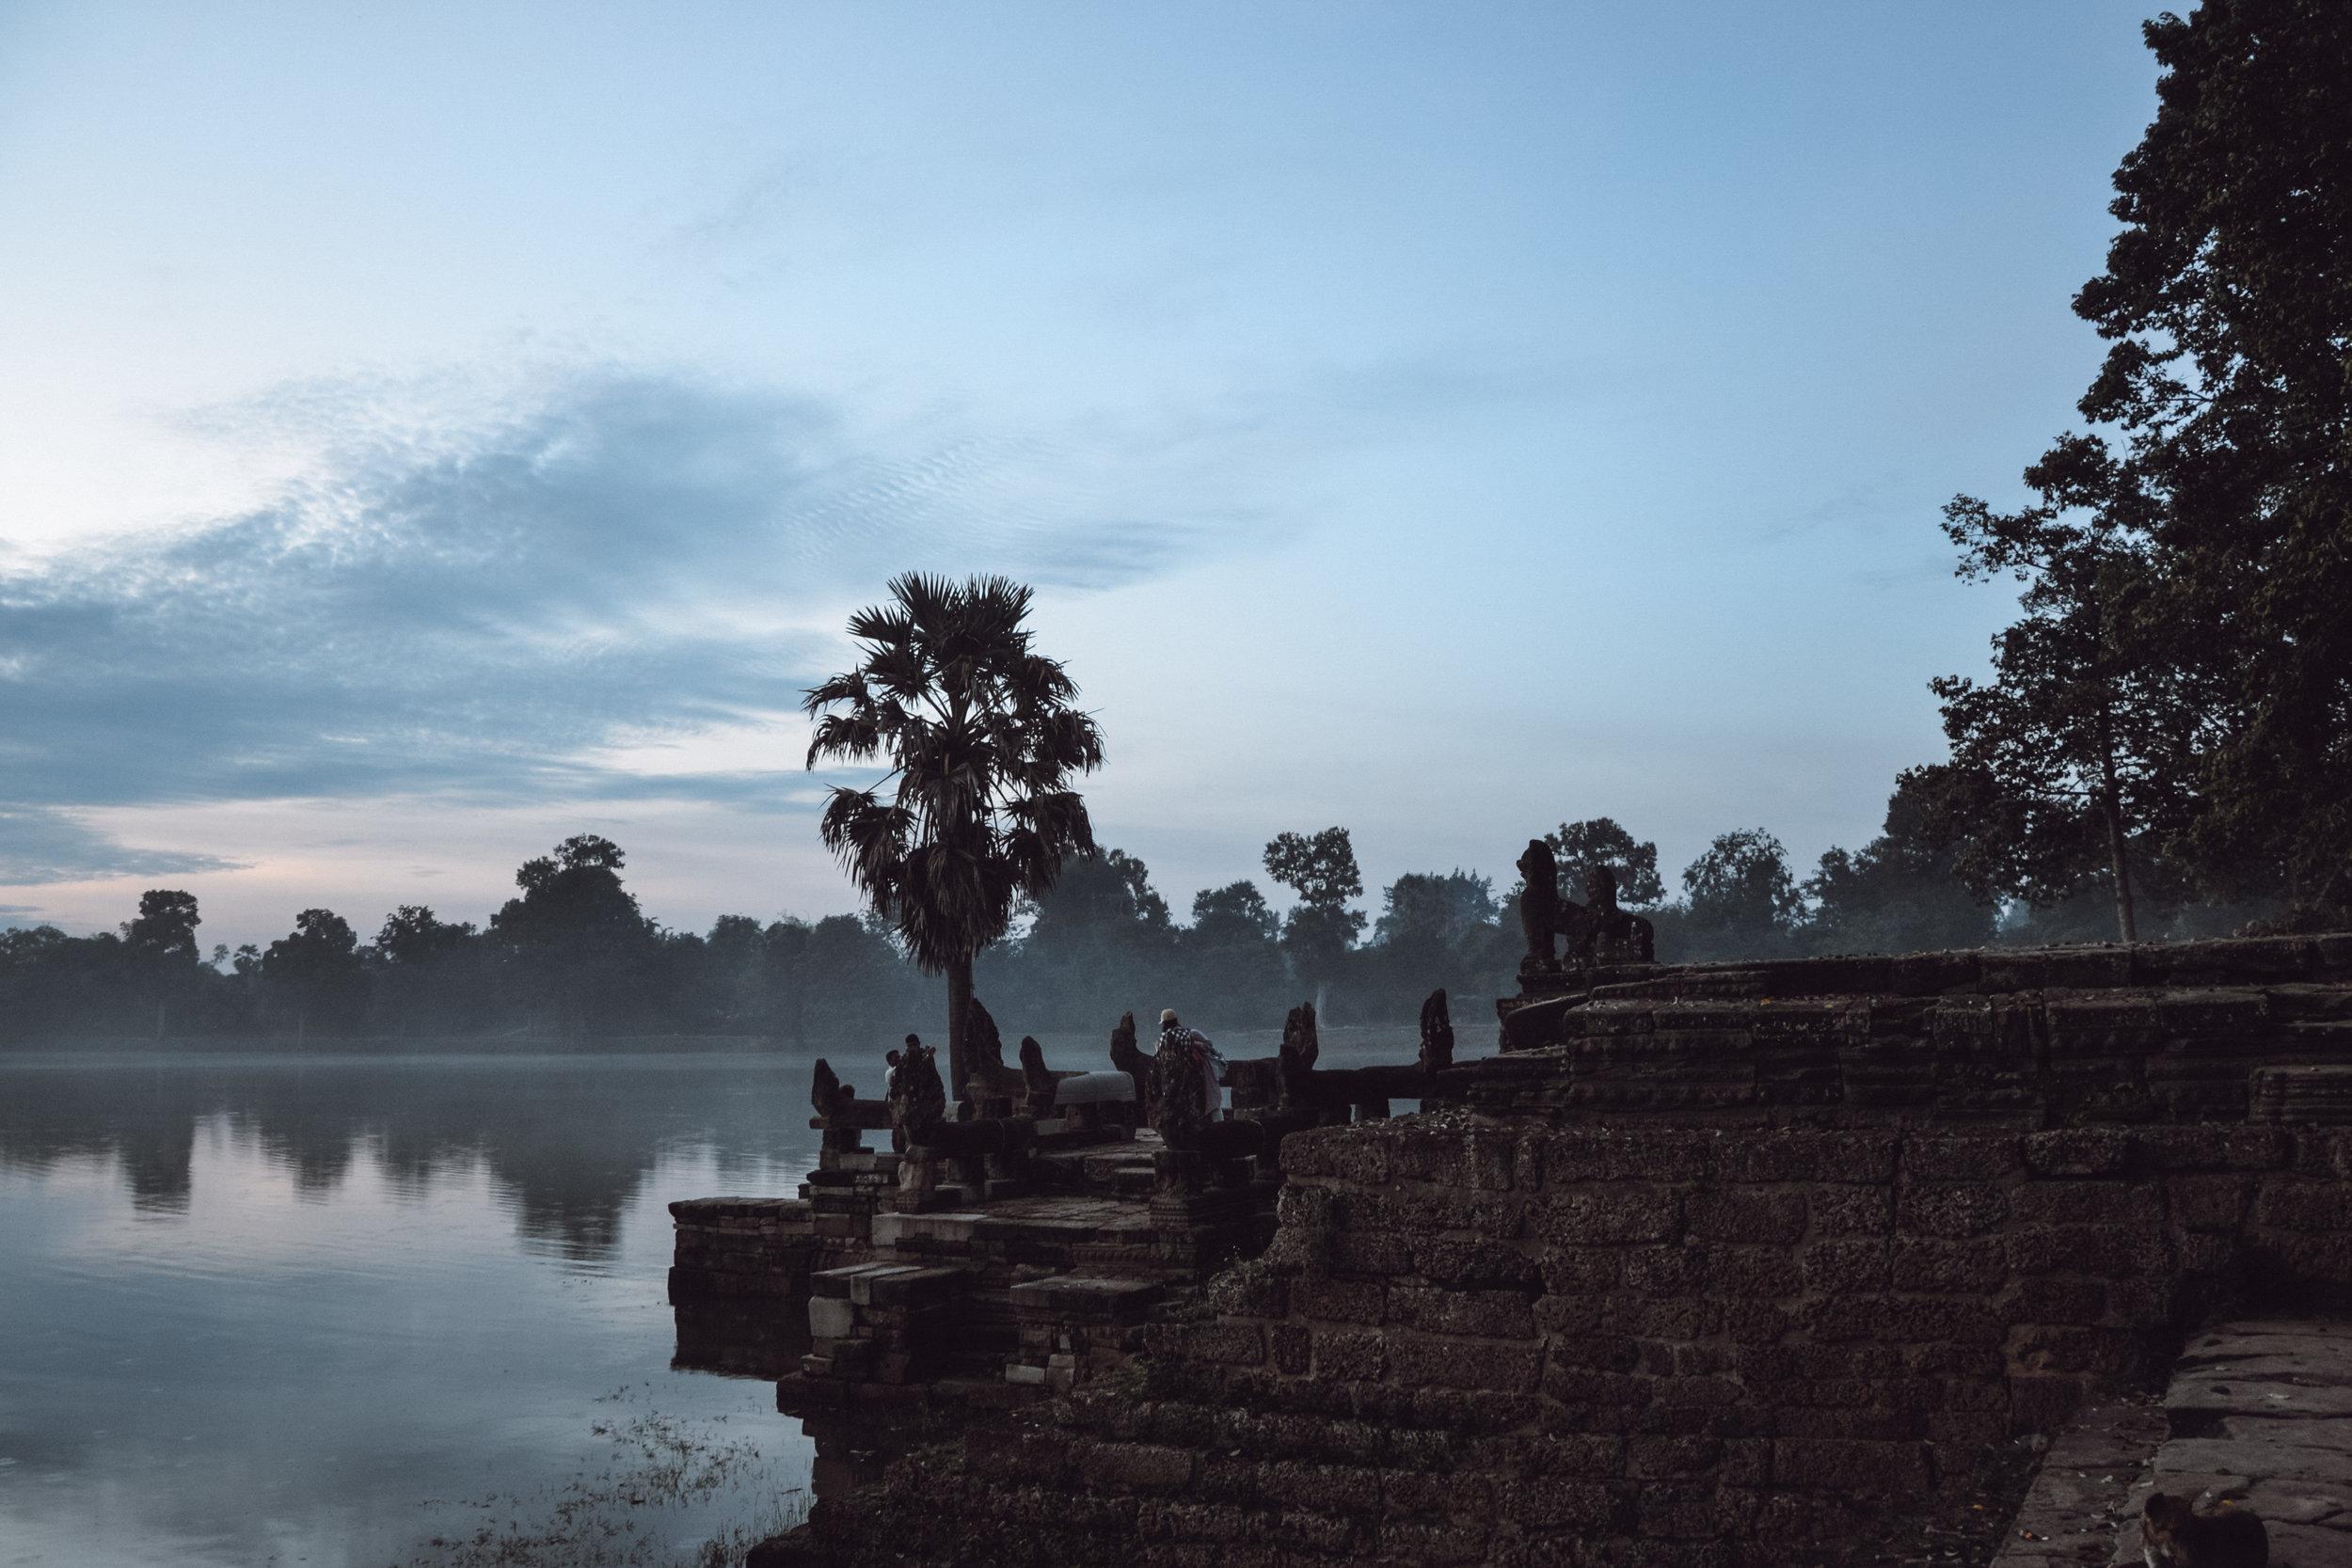 Fosca-Raia-Angkor-Sunrise-Luis-Viajante